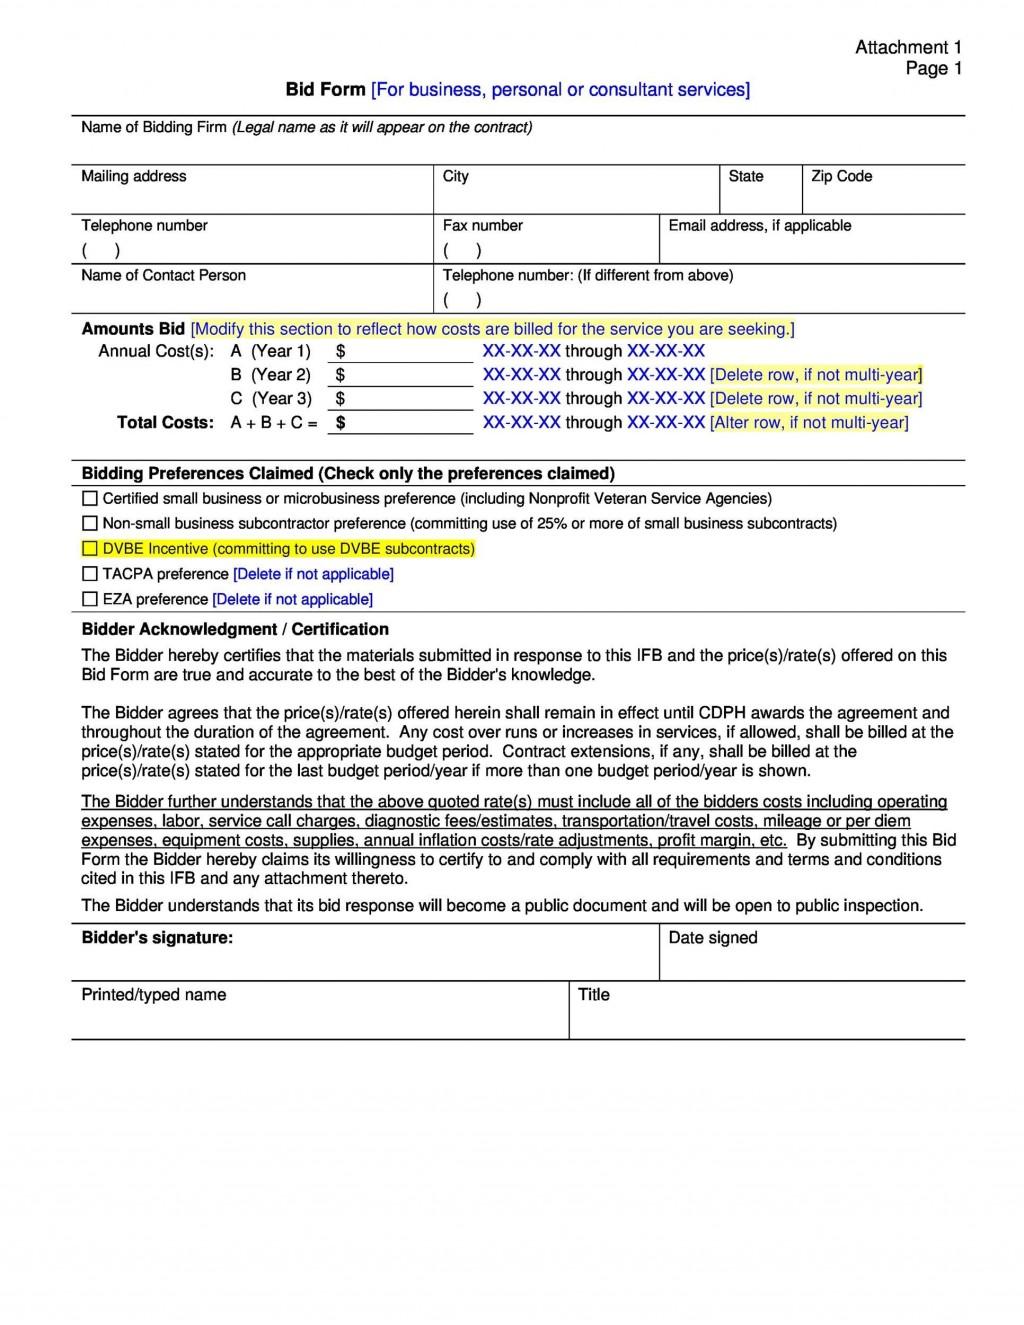 007 Incredible Free Bid Proposal Template Photo  Printable Form Word Construction DownloadLarge